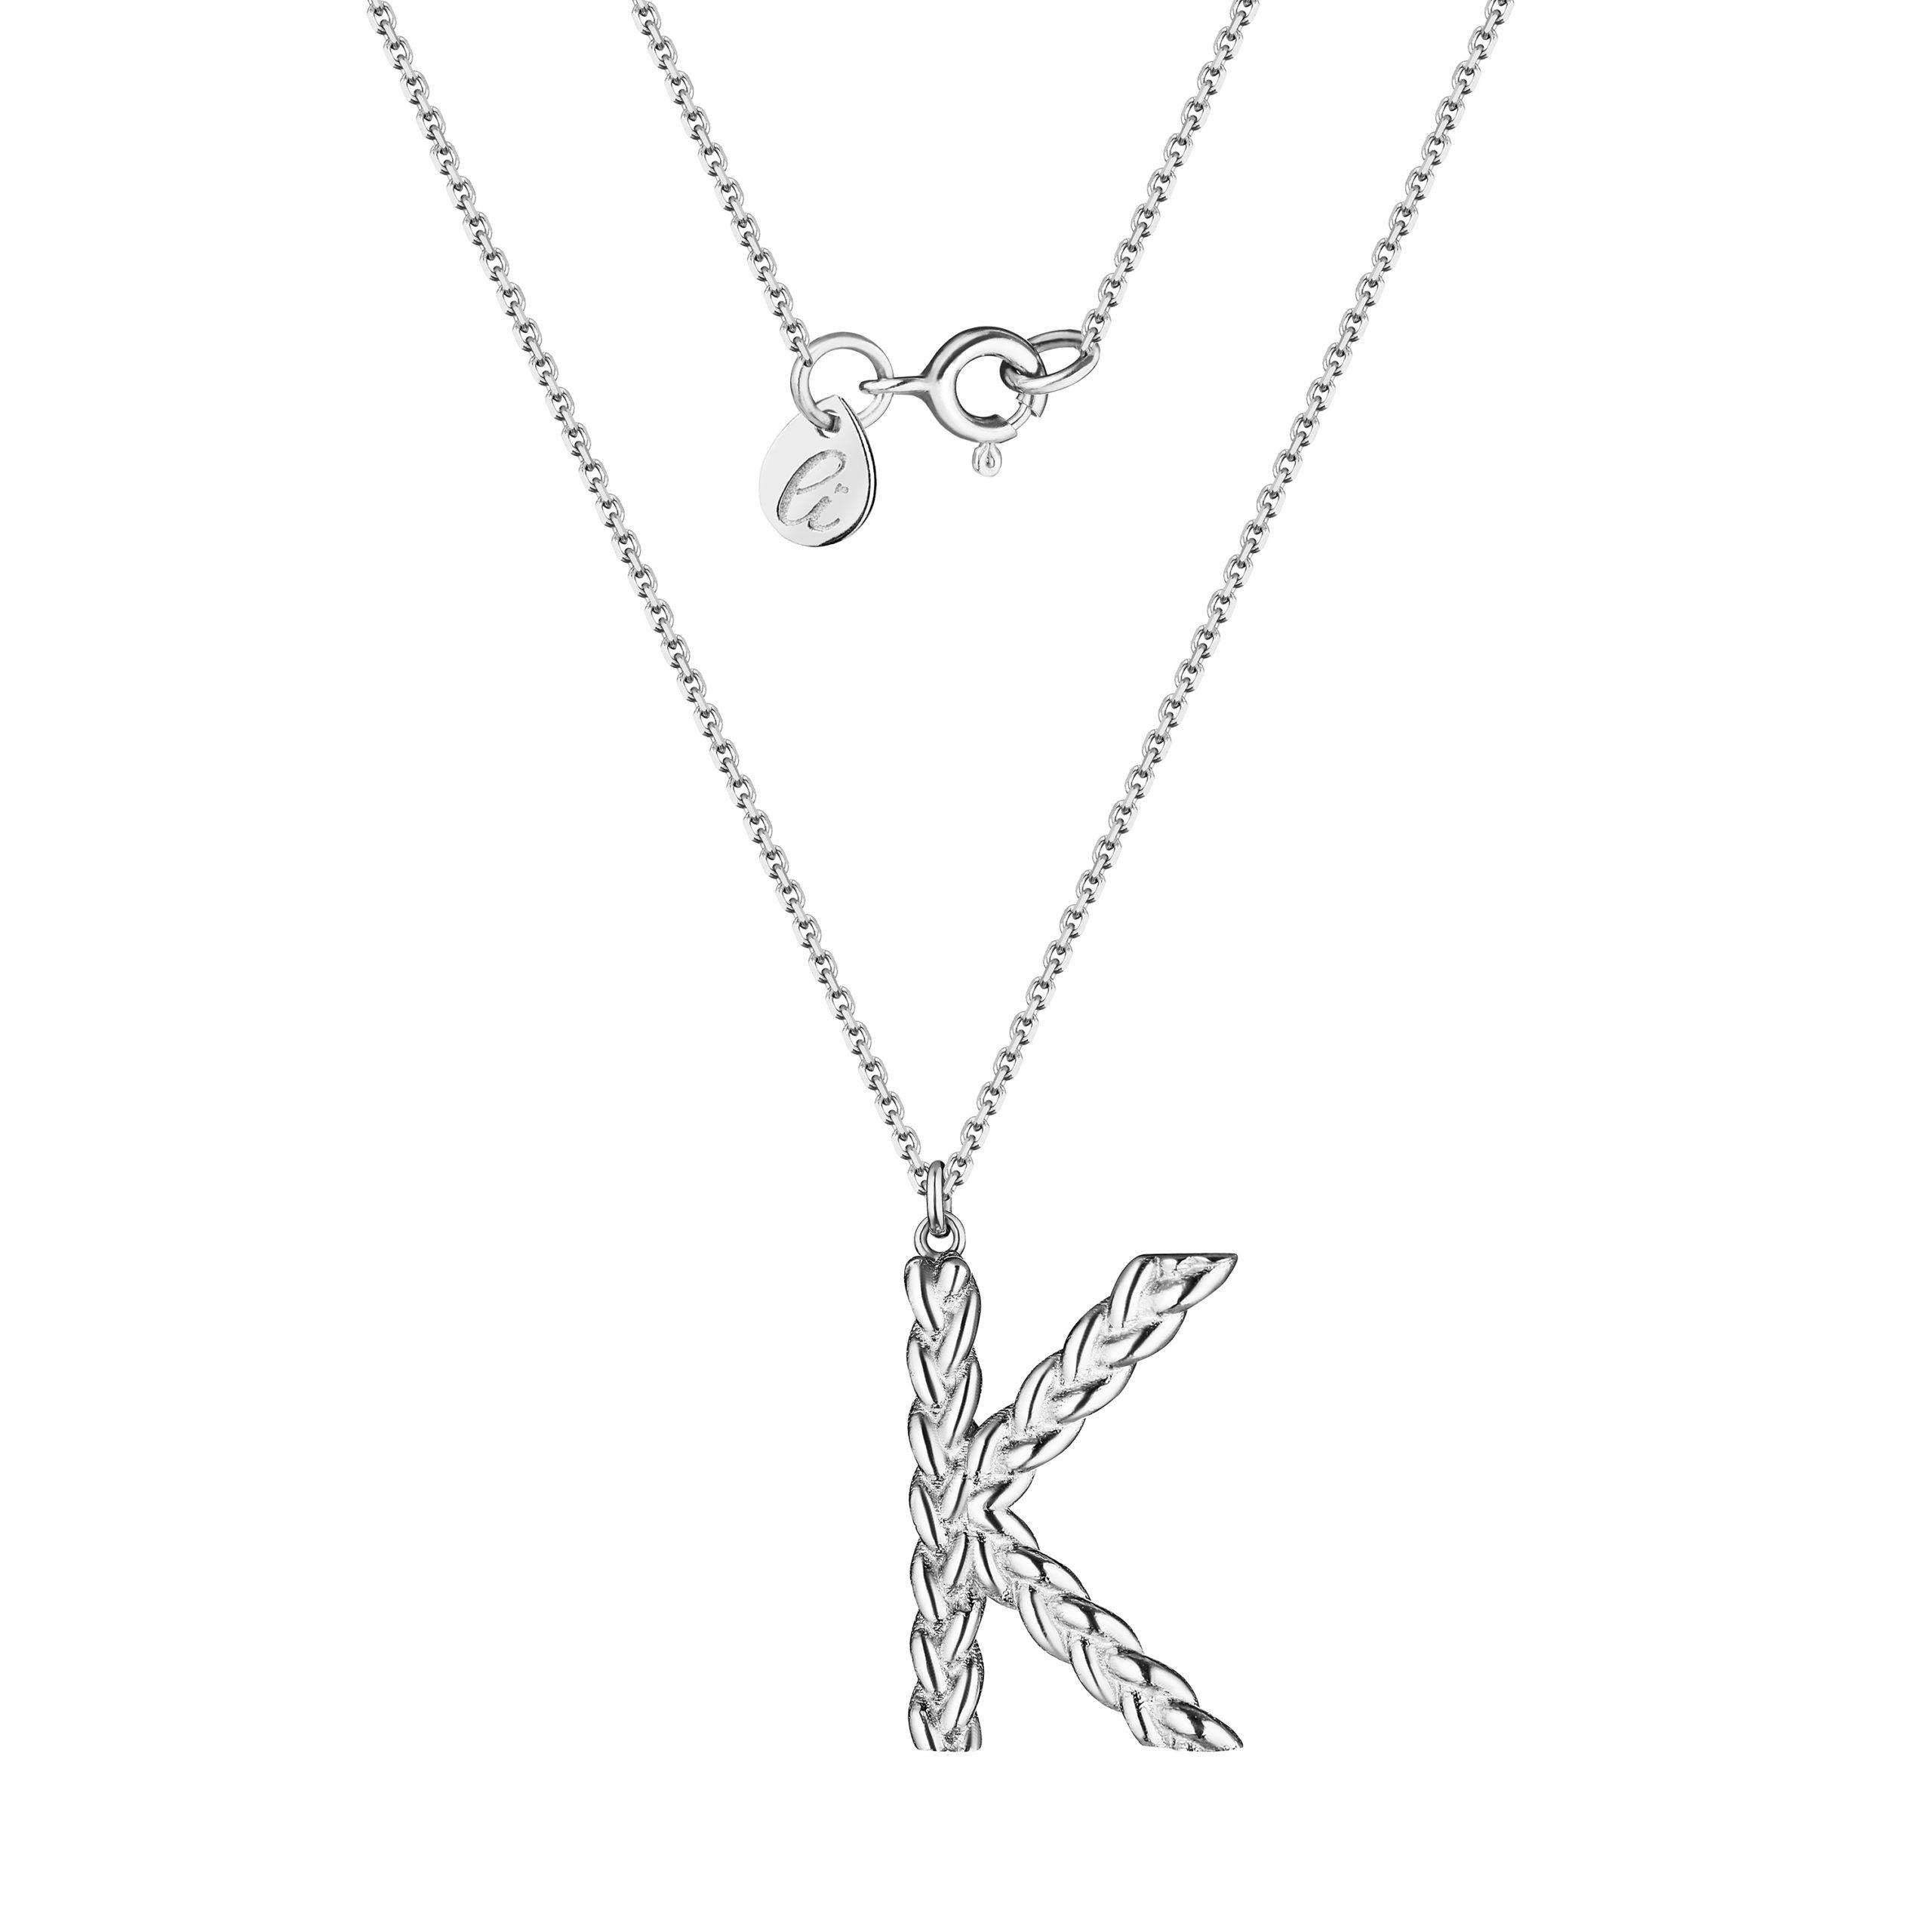 Буква К из серебра на серебряной цепочке